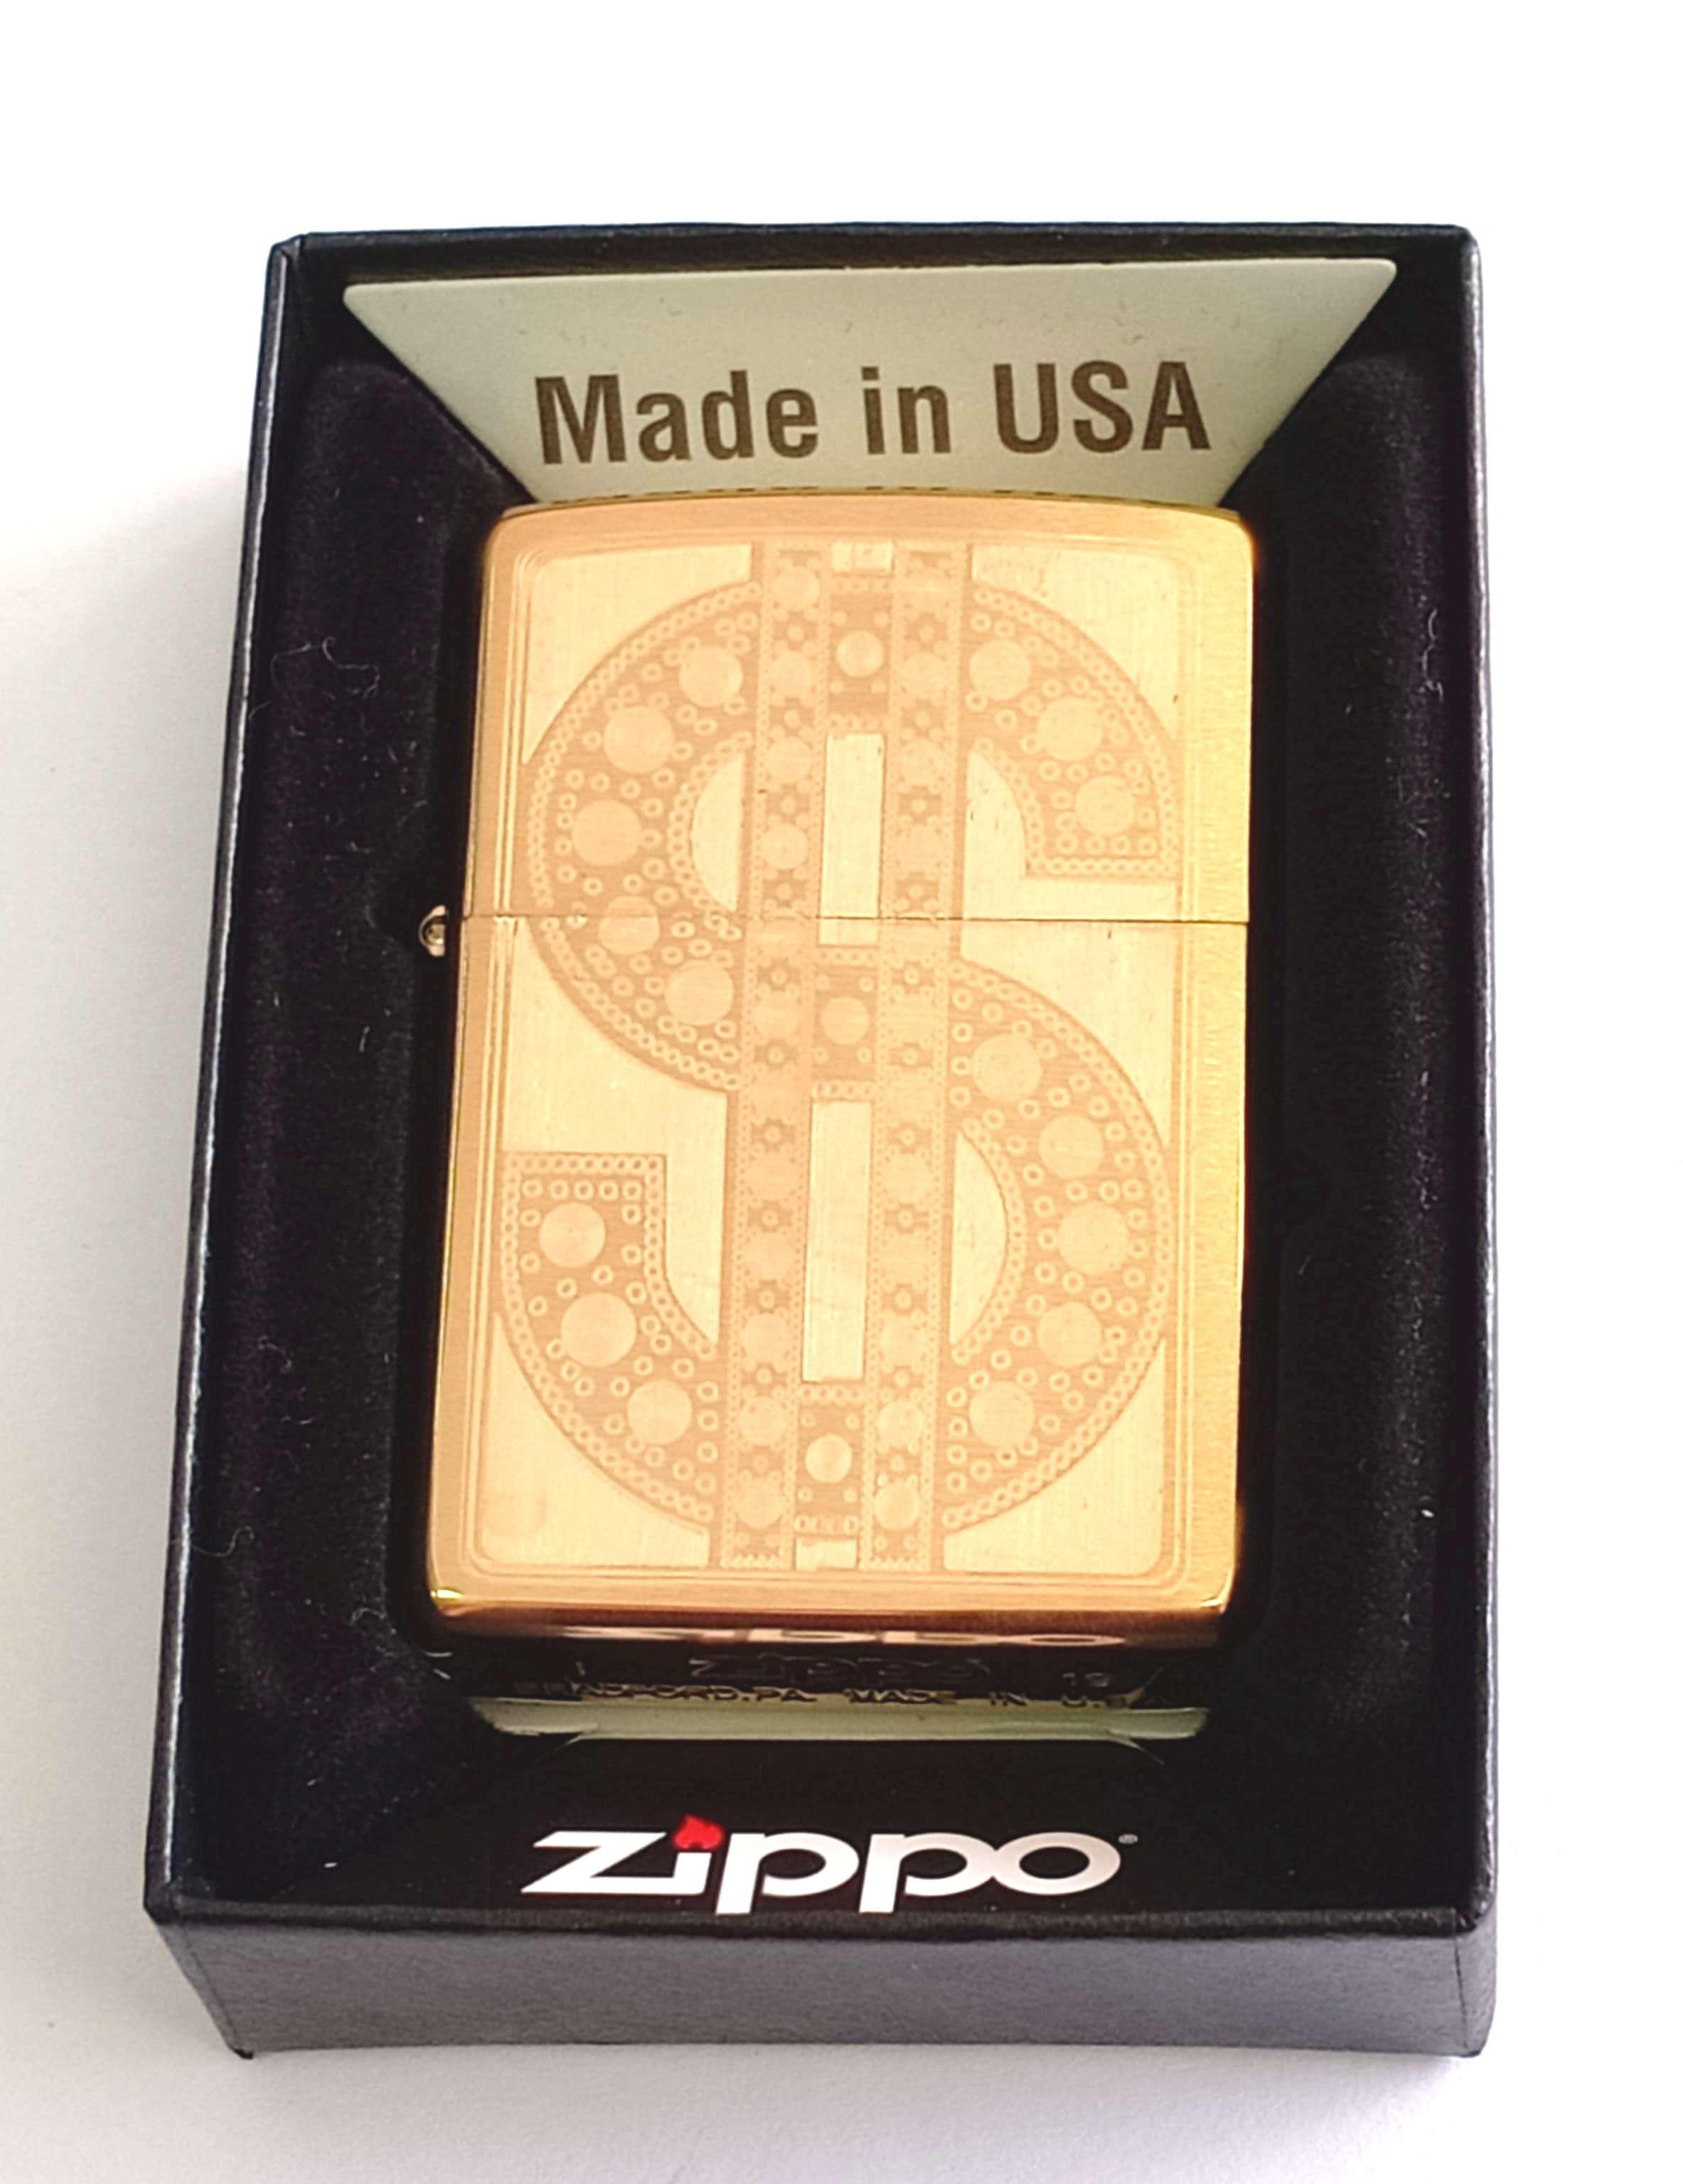 Zippo vang nham khac sau 1 mat hinh $ Z852